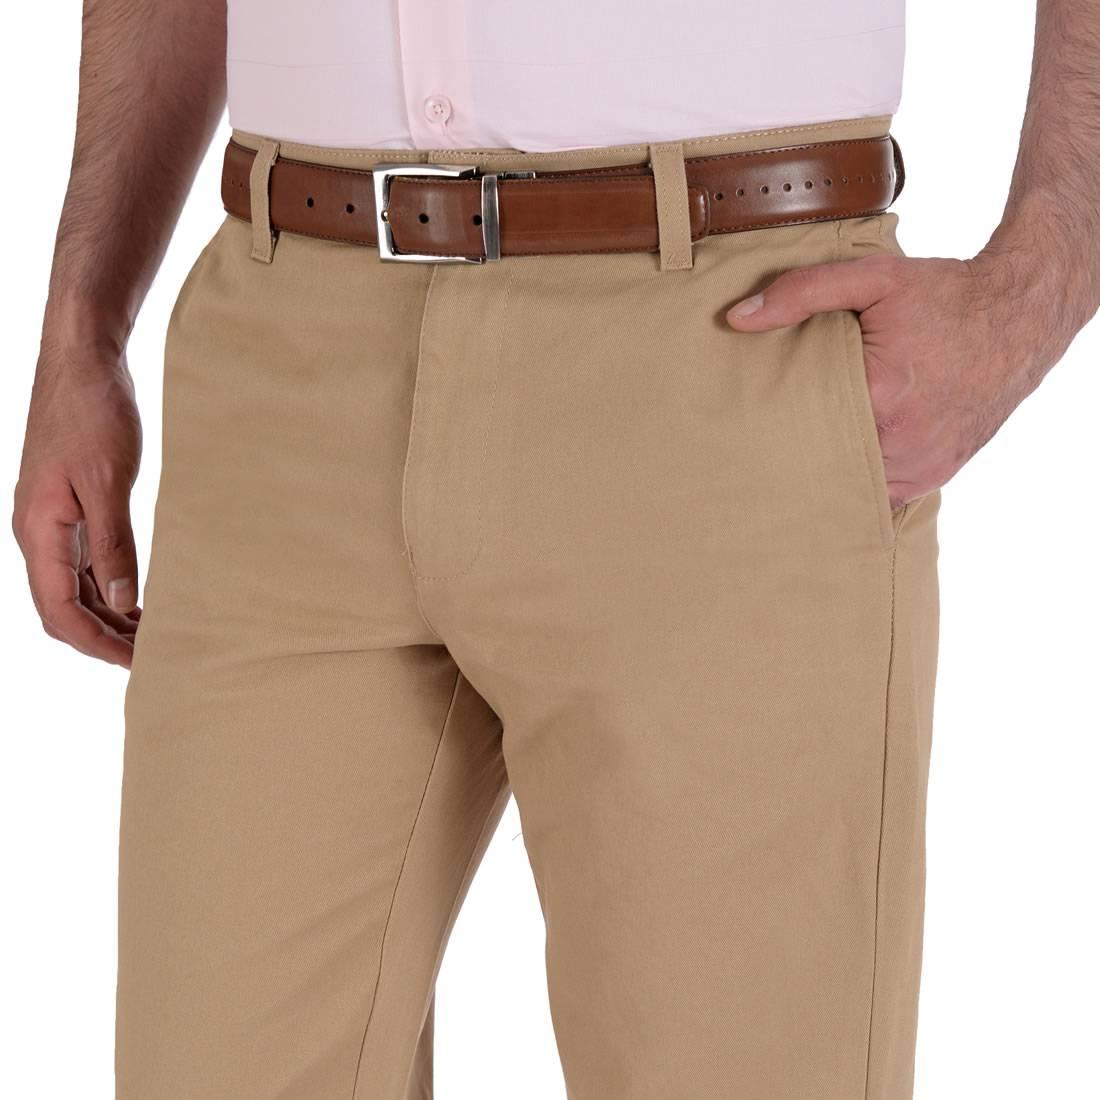 010811074467-03-Pantalon-Casual-Sin-Pinzas-Classic-Fit-Kaki-yale